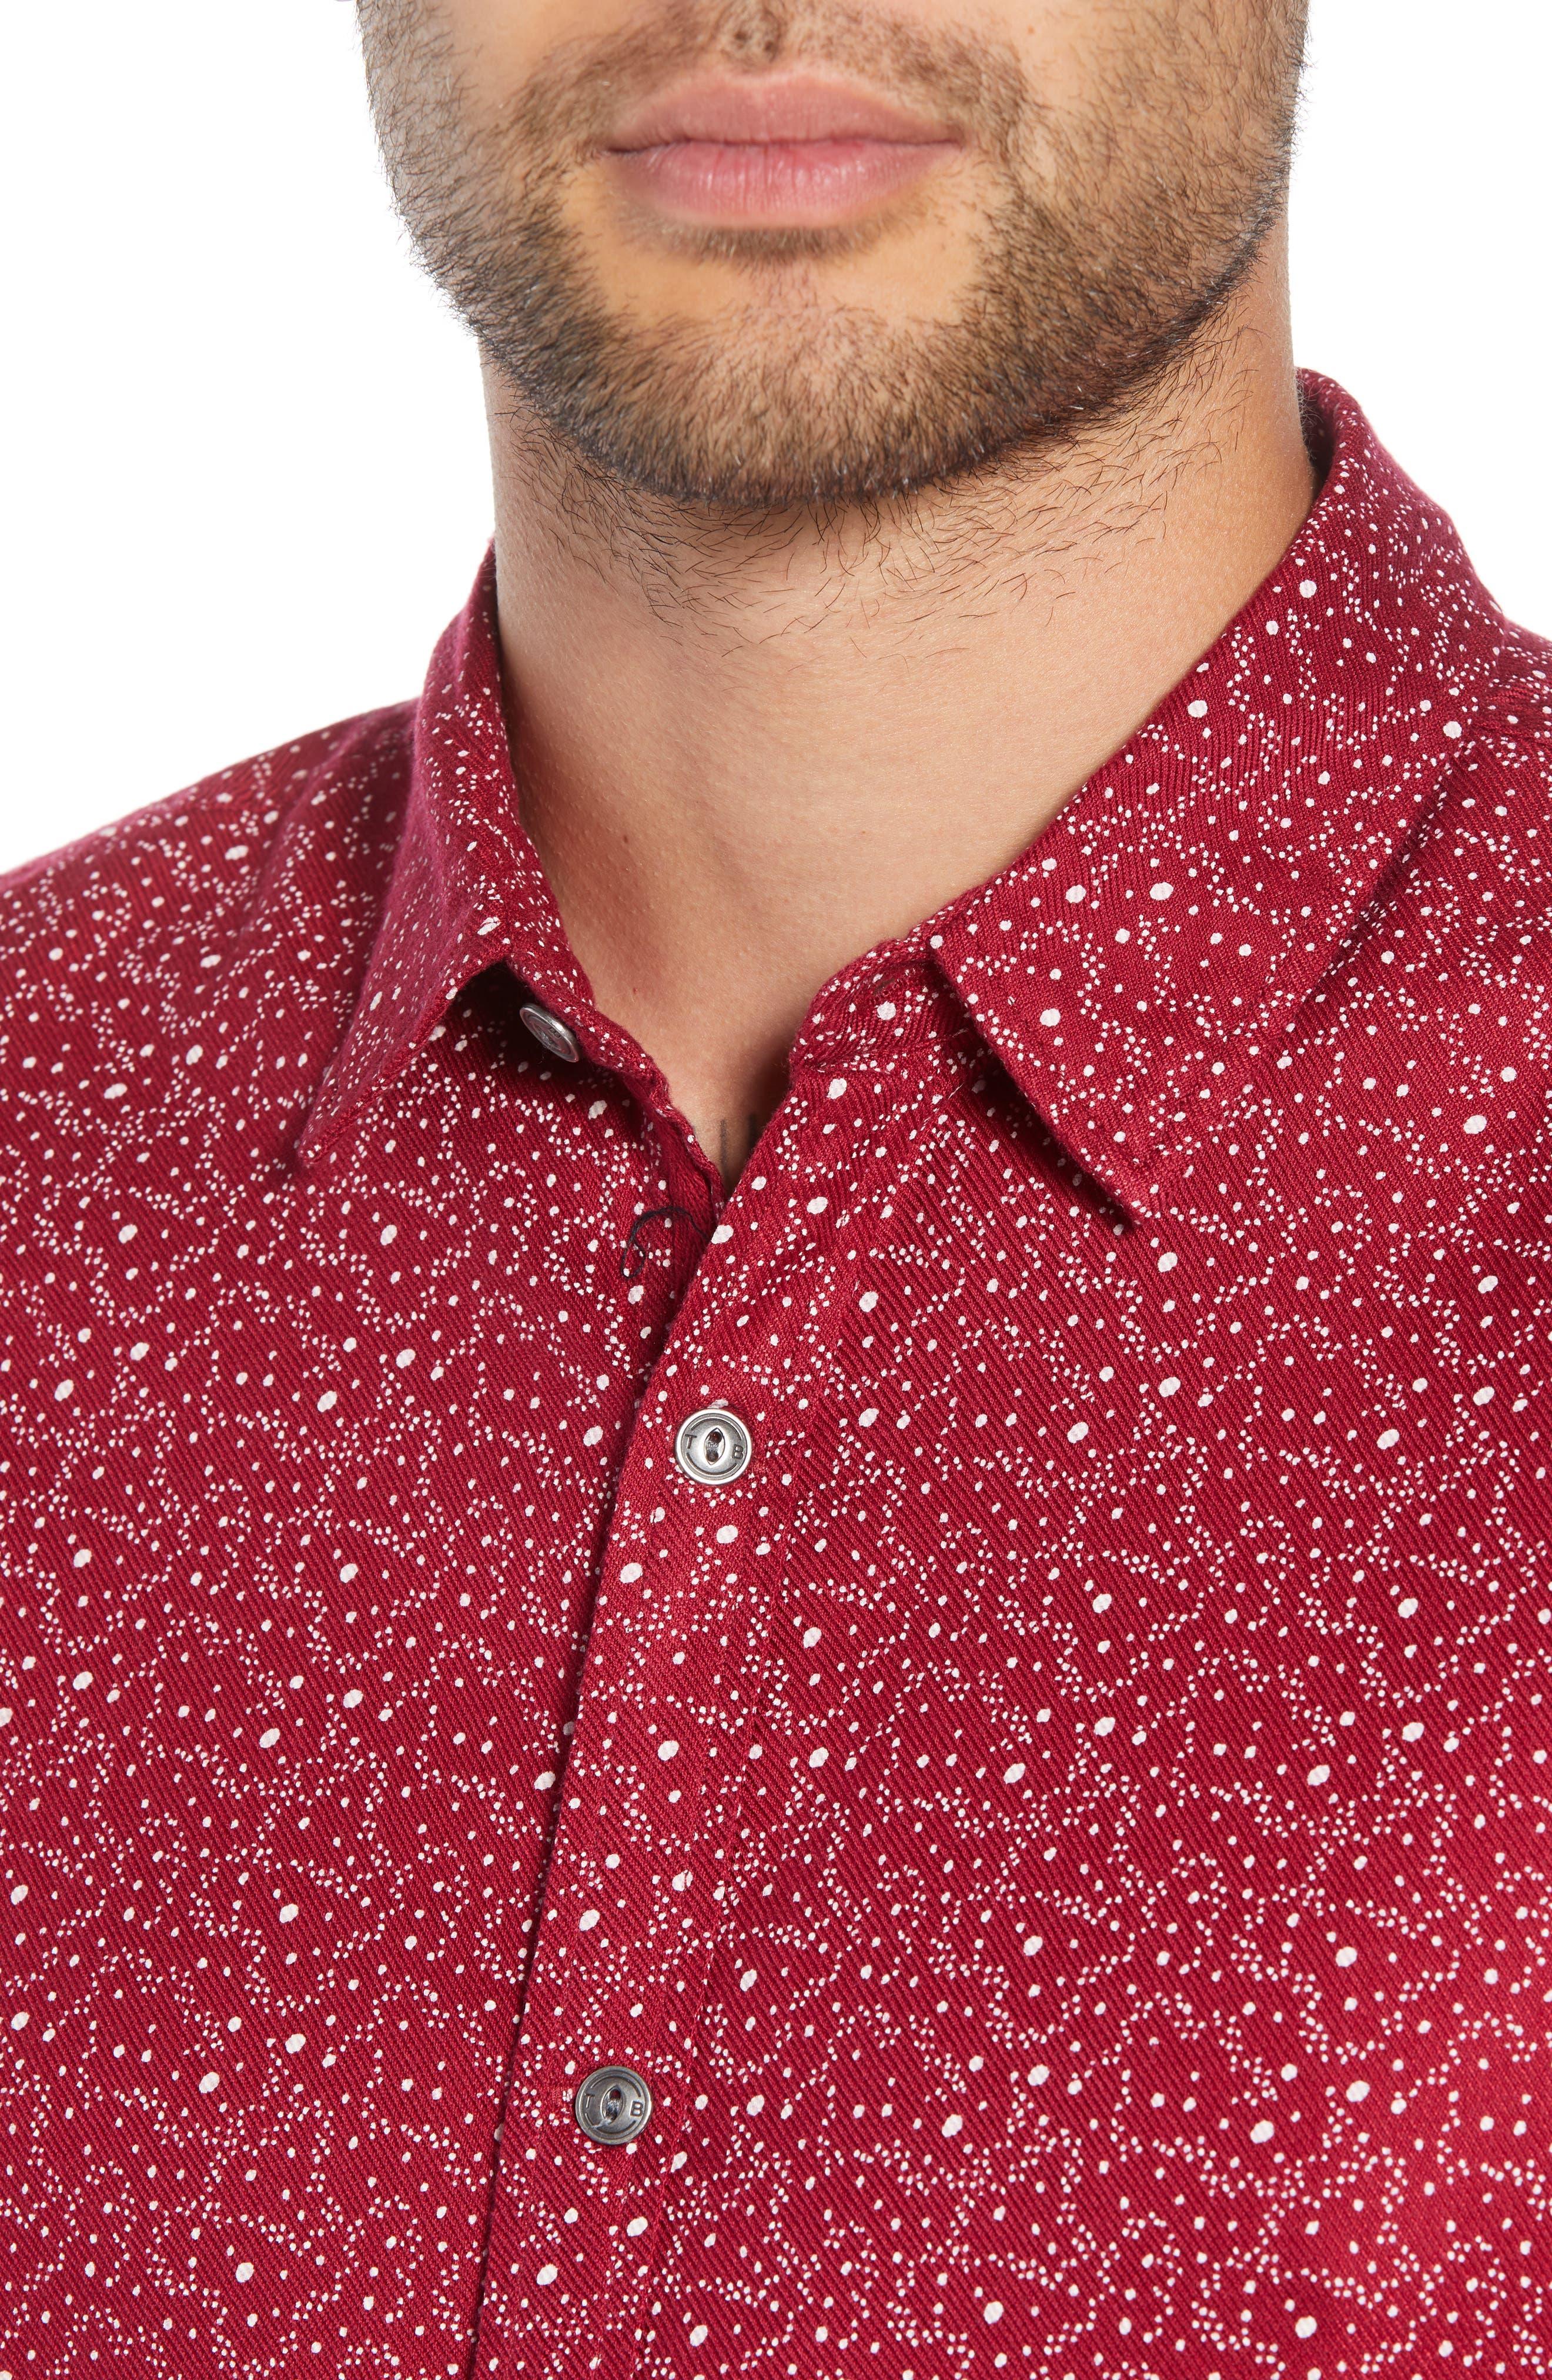 Trim Fit Print Sport Shirt,                             Alternate thumbnail 4, color,                             RED RUMBA CENTAURI